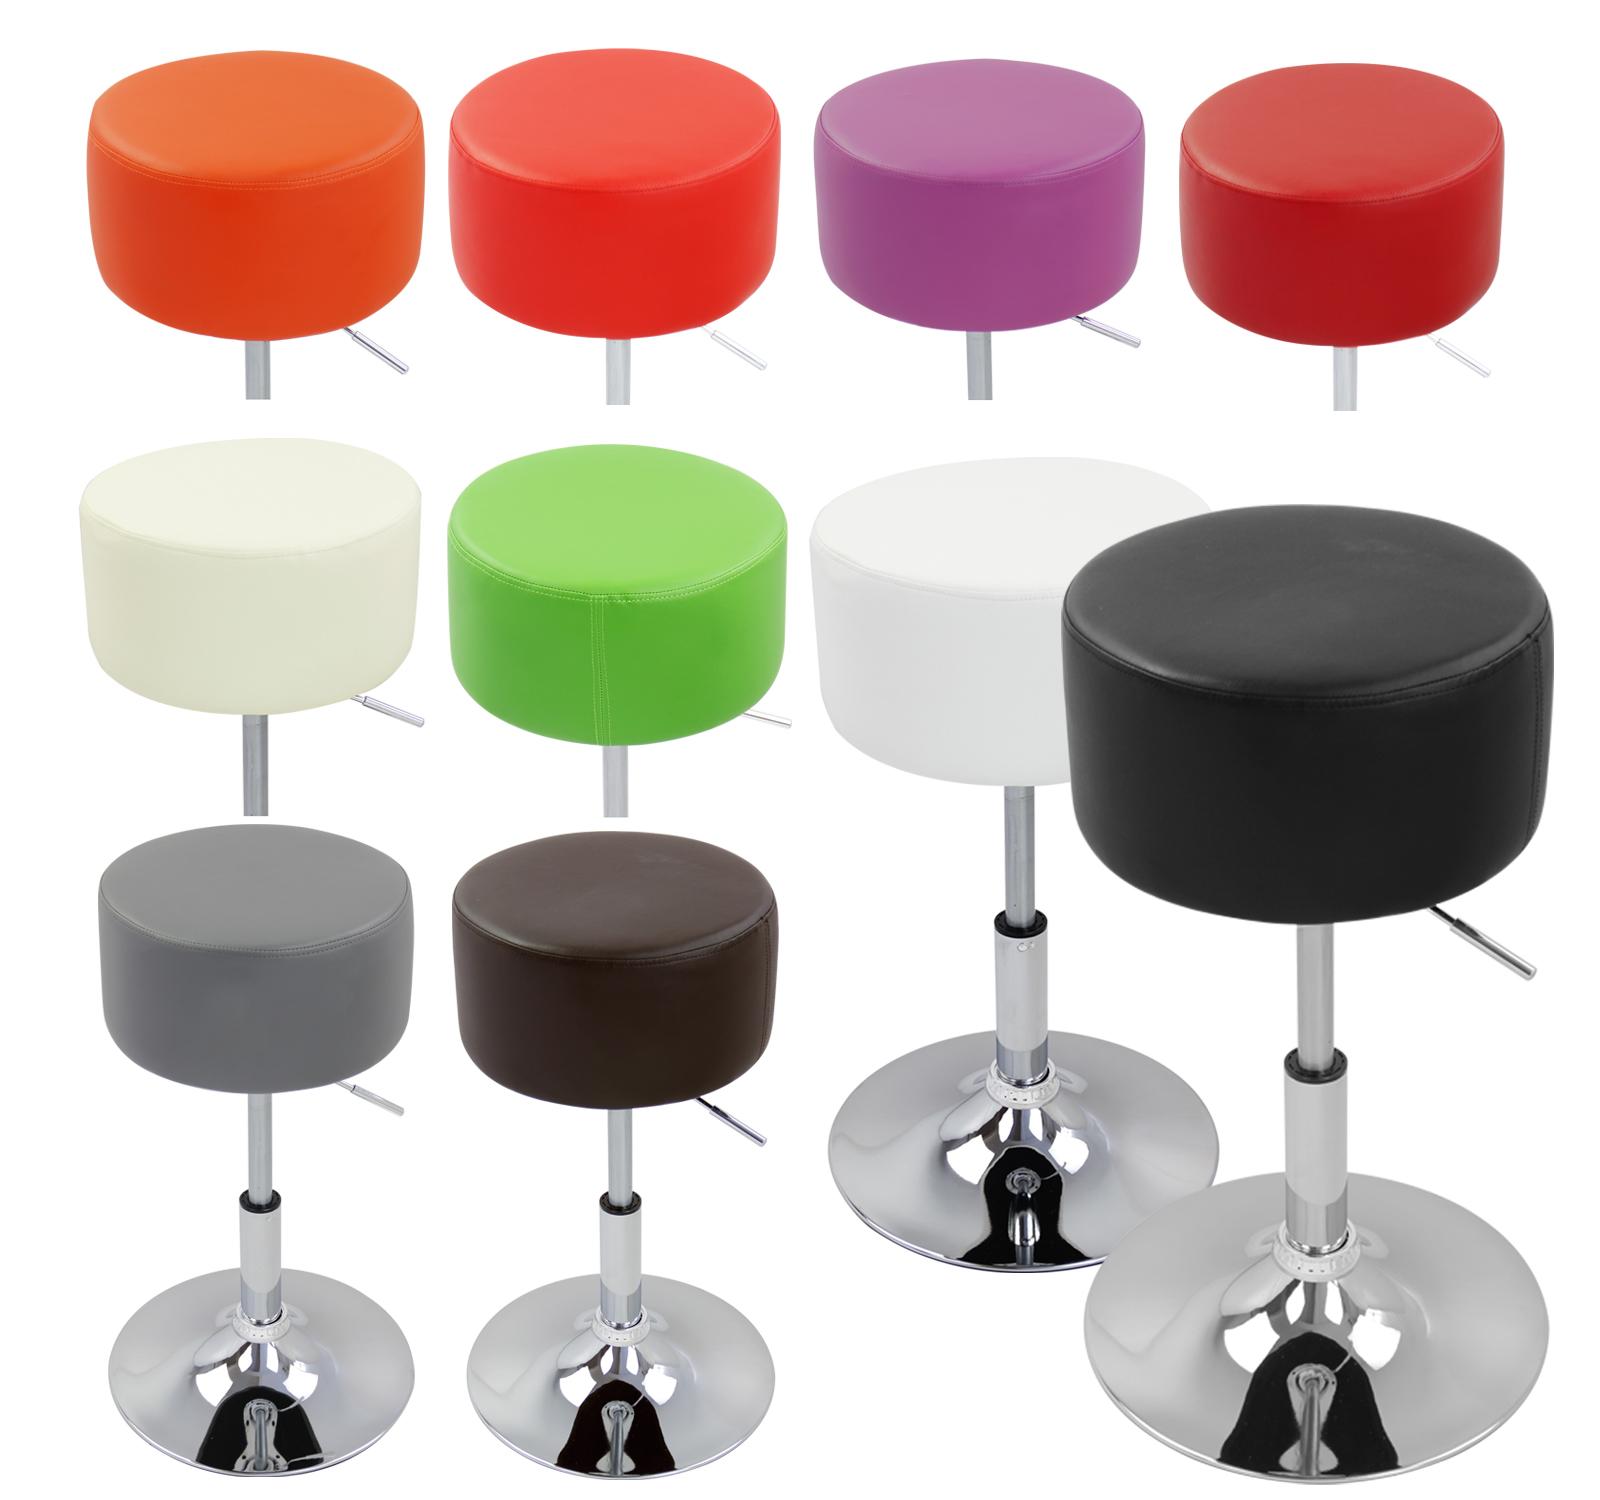 hocker 2er mit griff kunstleder verchromt stahl sitzhocker drehhocker stuhl 73 ebay. Black Bedroom Furniture Sets. Home Design Ideas